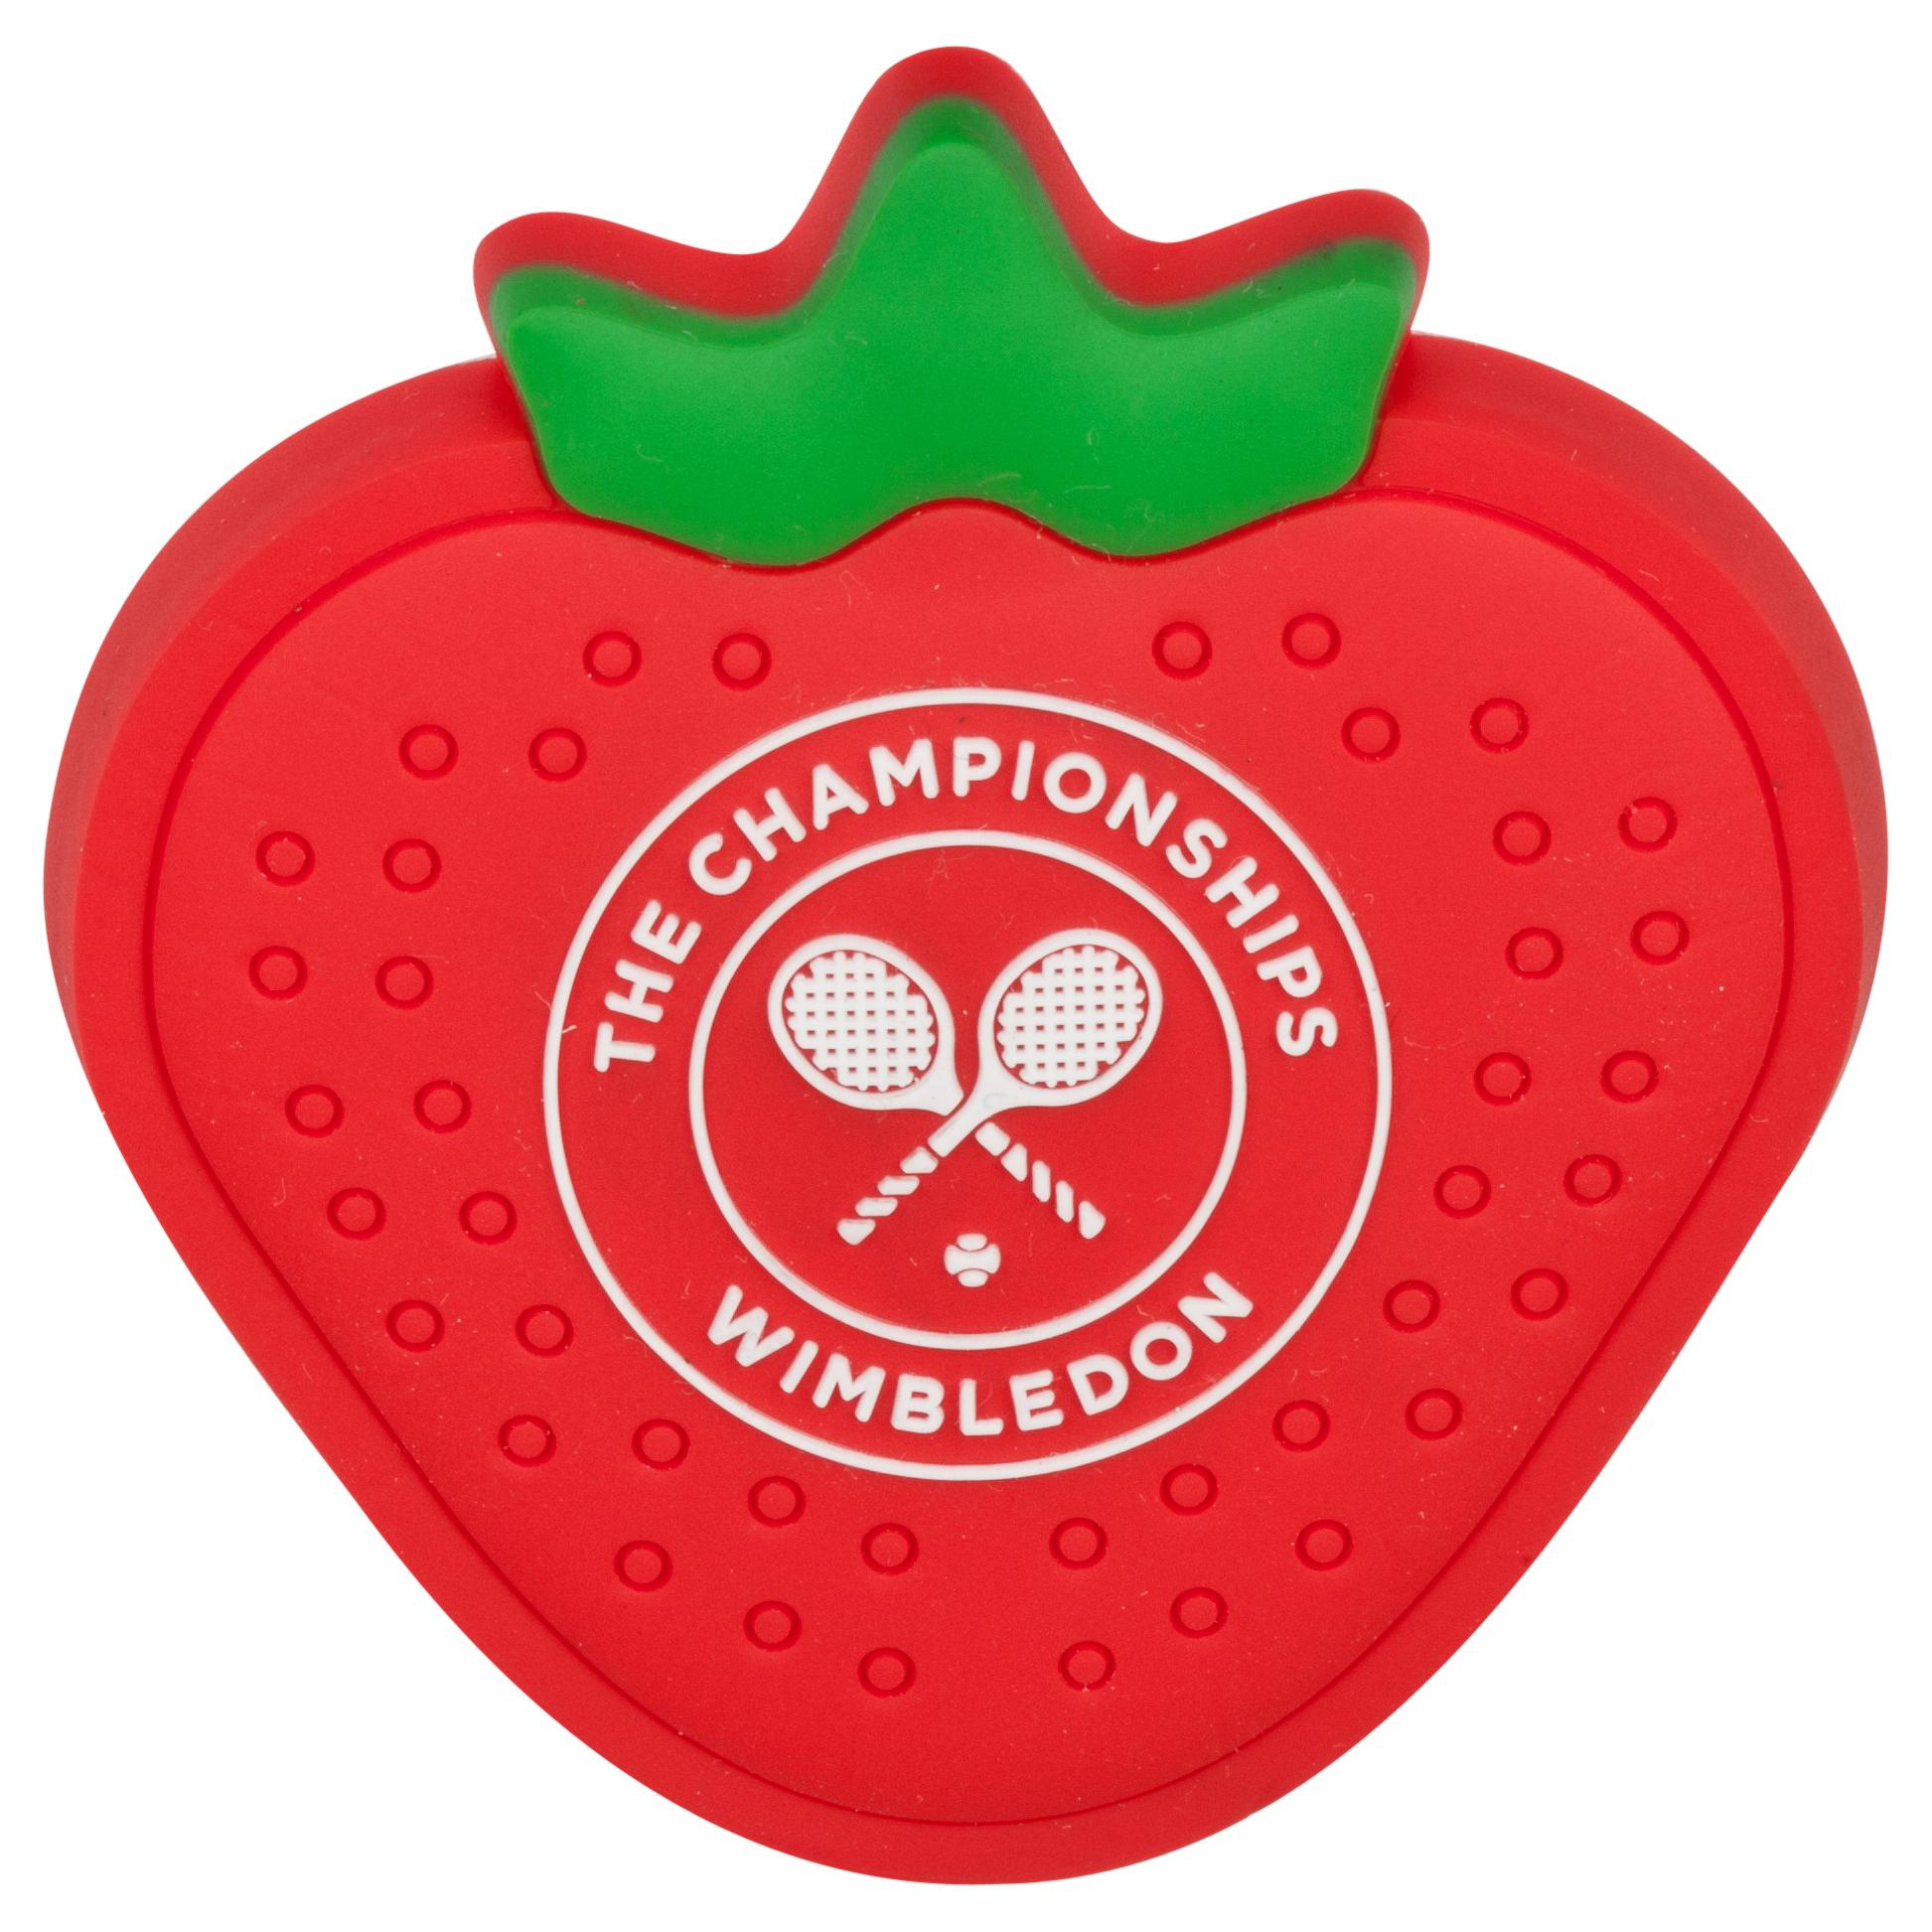 Wimbledon Strawberry Magnet